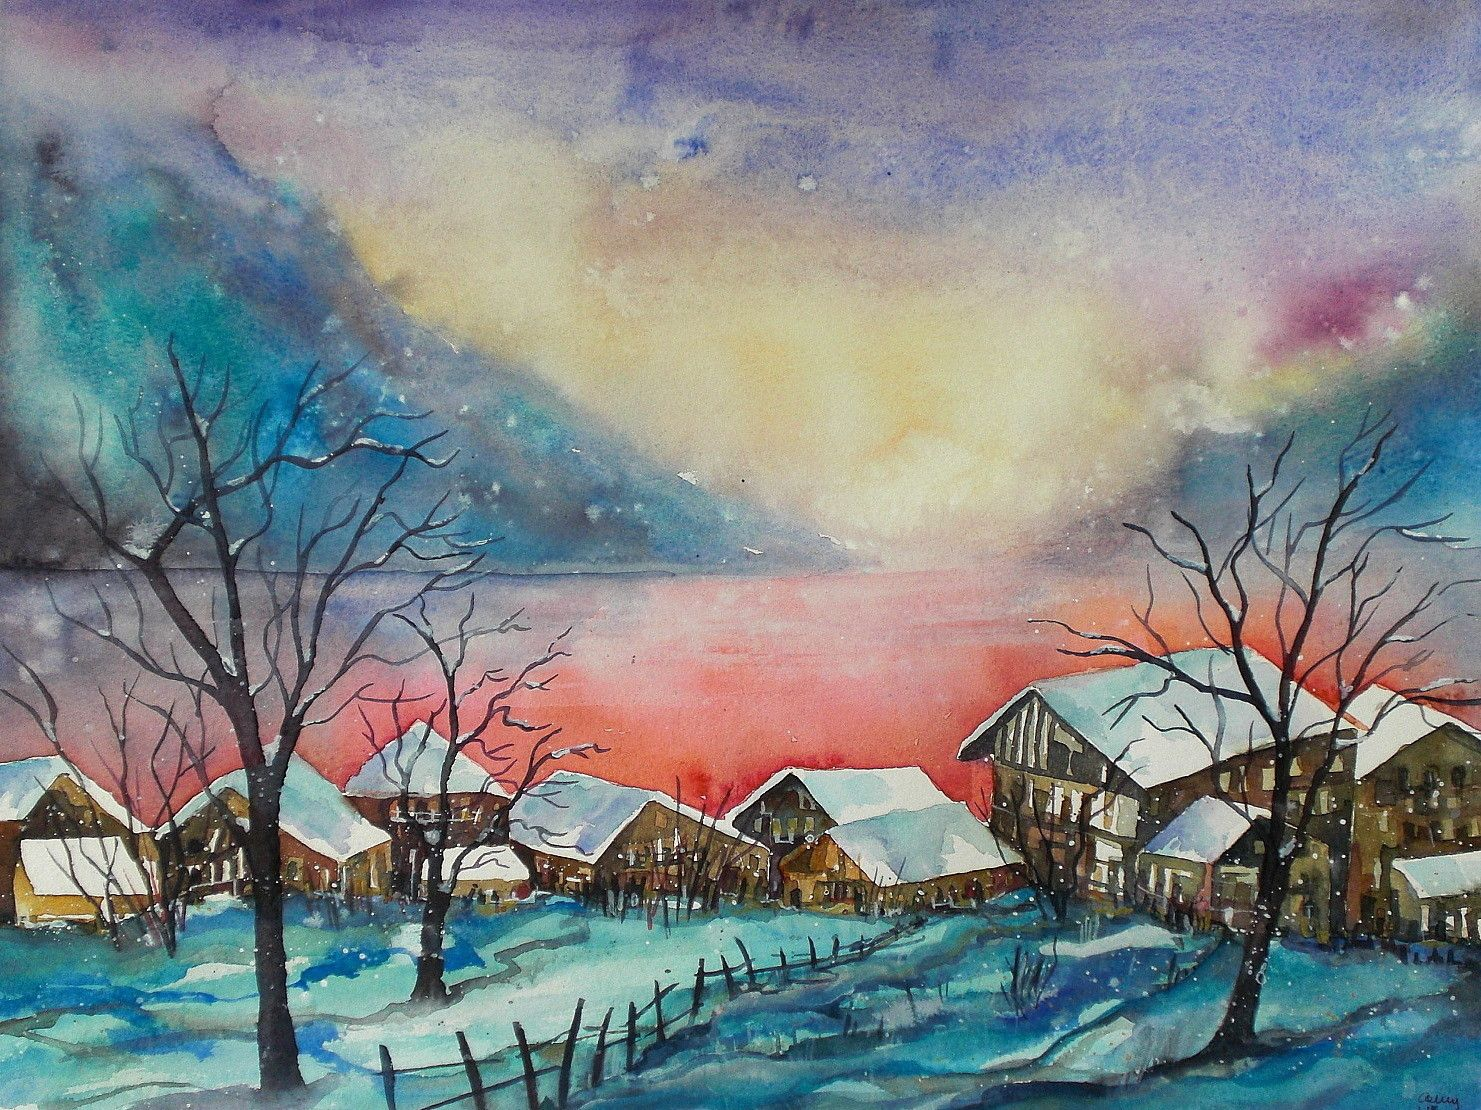 aquarell winter schnee winterlandschaft watercolor landscape snow kunst pinterest. Black Bedroom Furniture Sets. Home Design Ideas